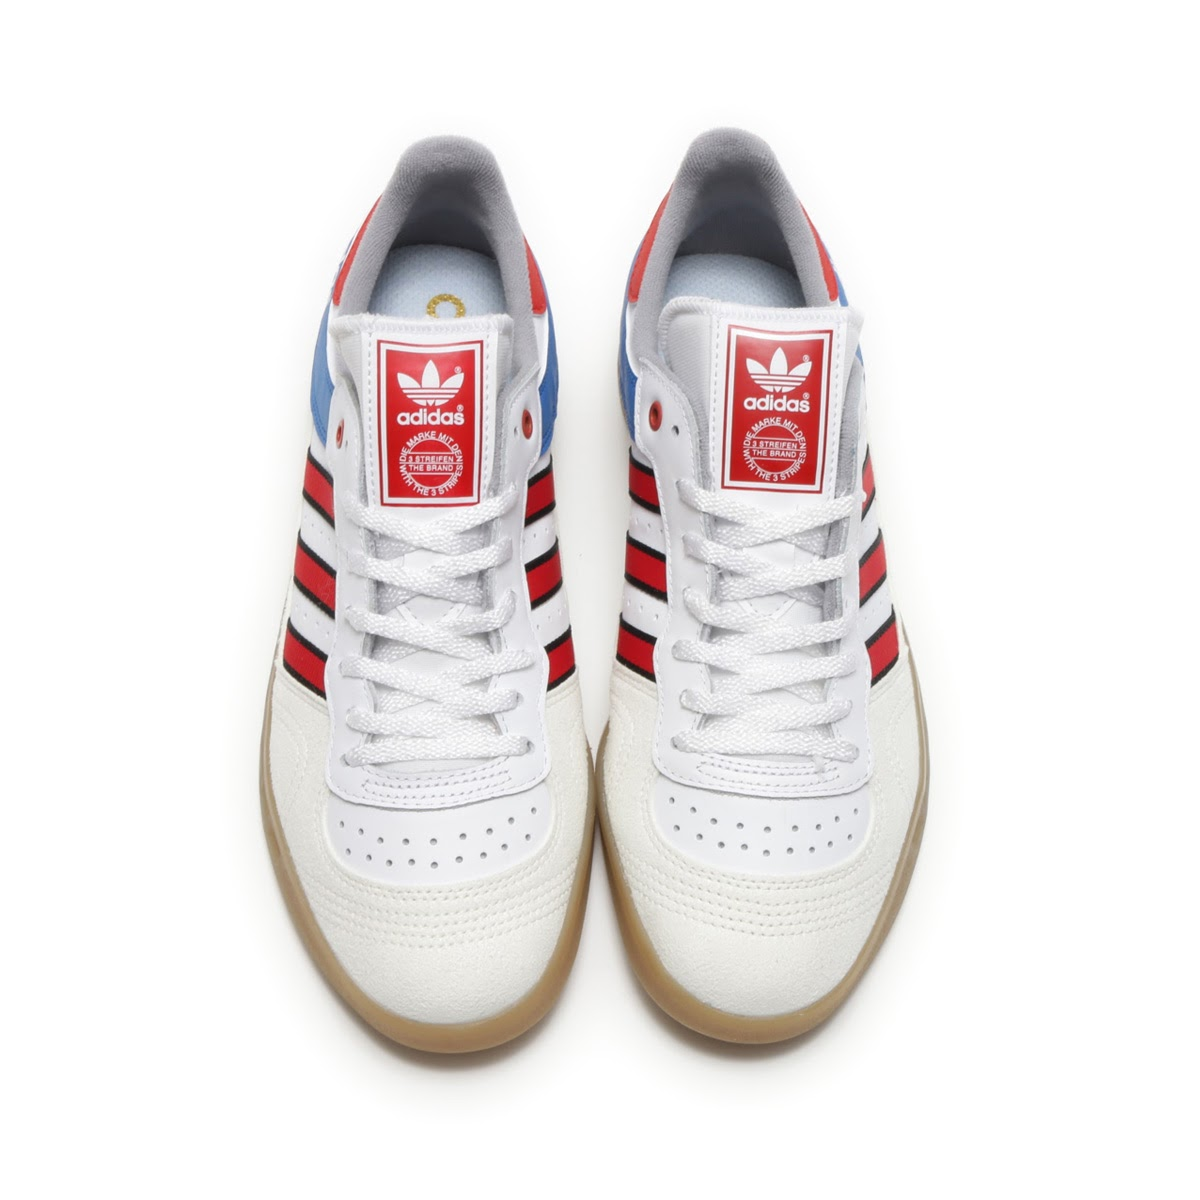 adidas originals handball top white red royal  7ffbc5b8e